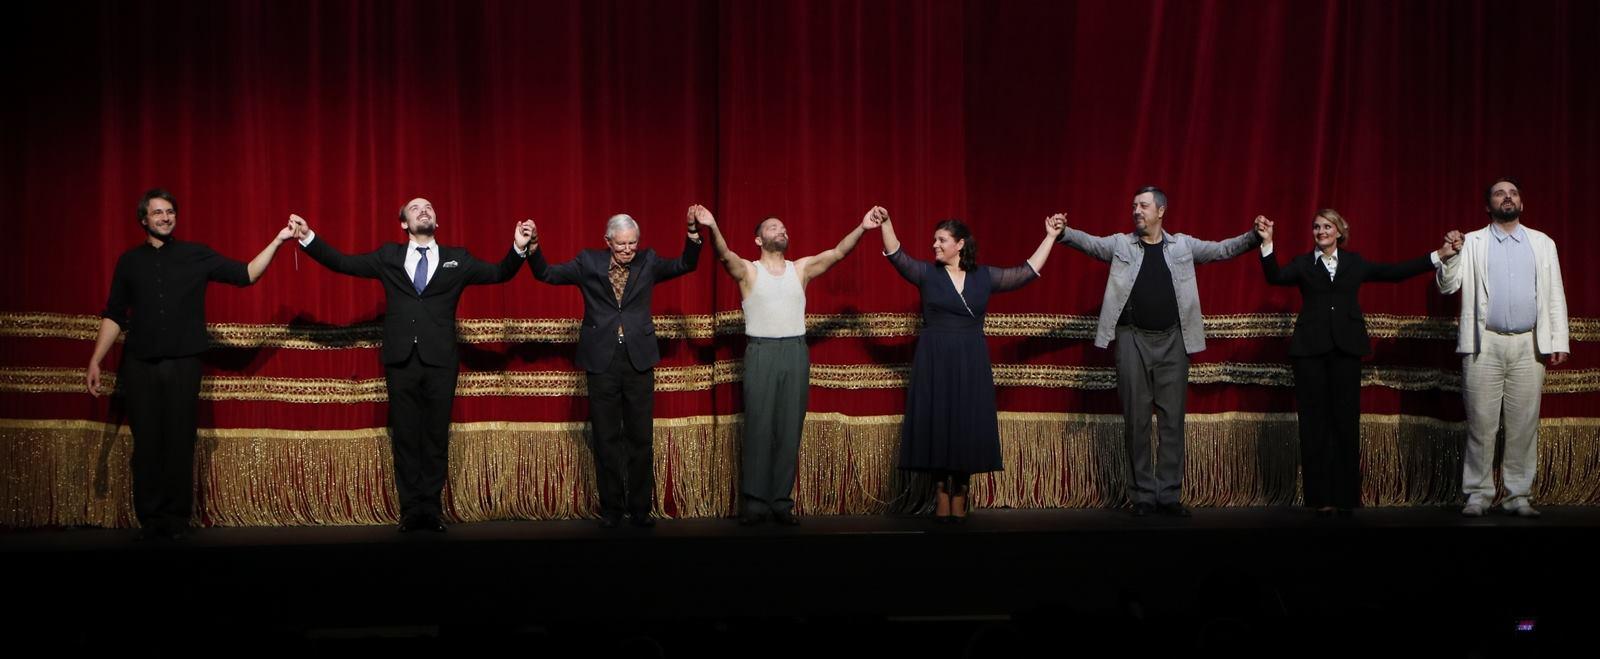 FOTO: Veliko oduševljenje publike na premijeri opere 'La boheme' u HNK Ivana pl. Zajca